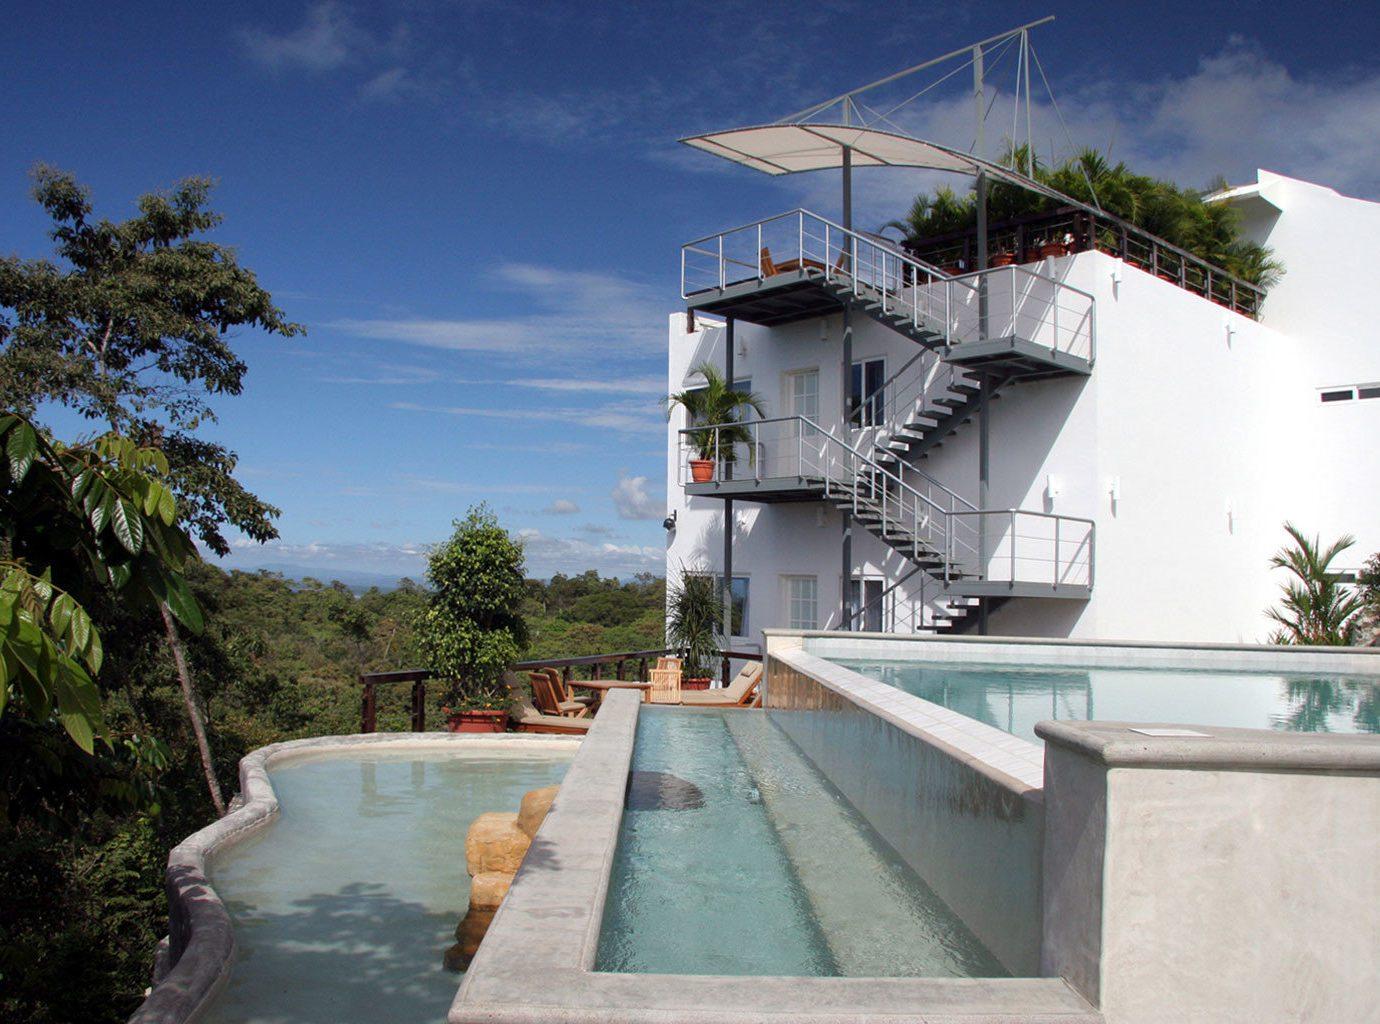 5-Star Adults Only Hotel In Manuel Antonio, Costa Rica - Gaia Hotel